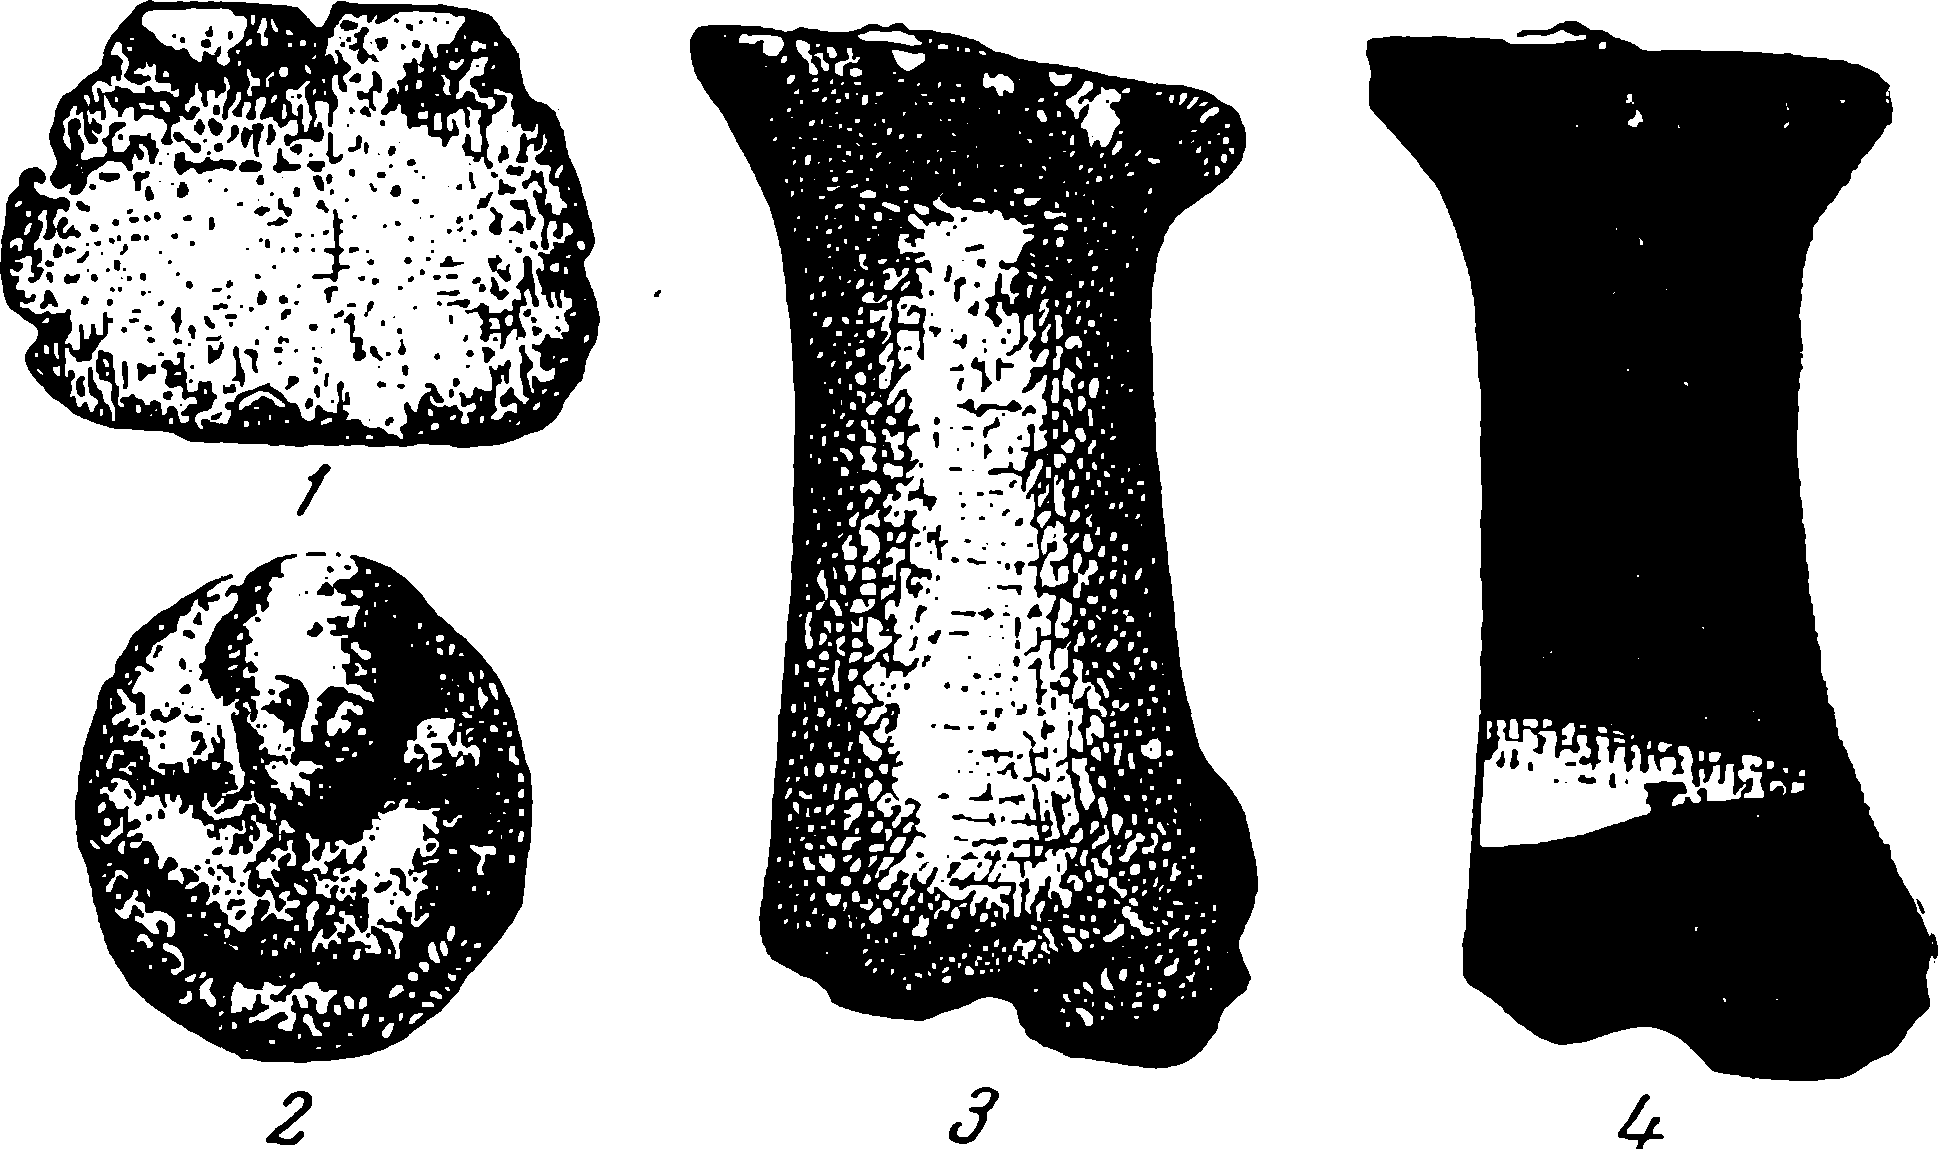 ap-16